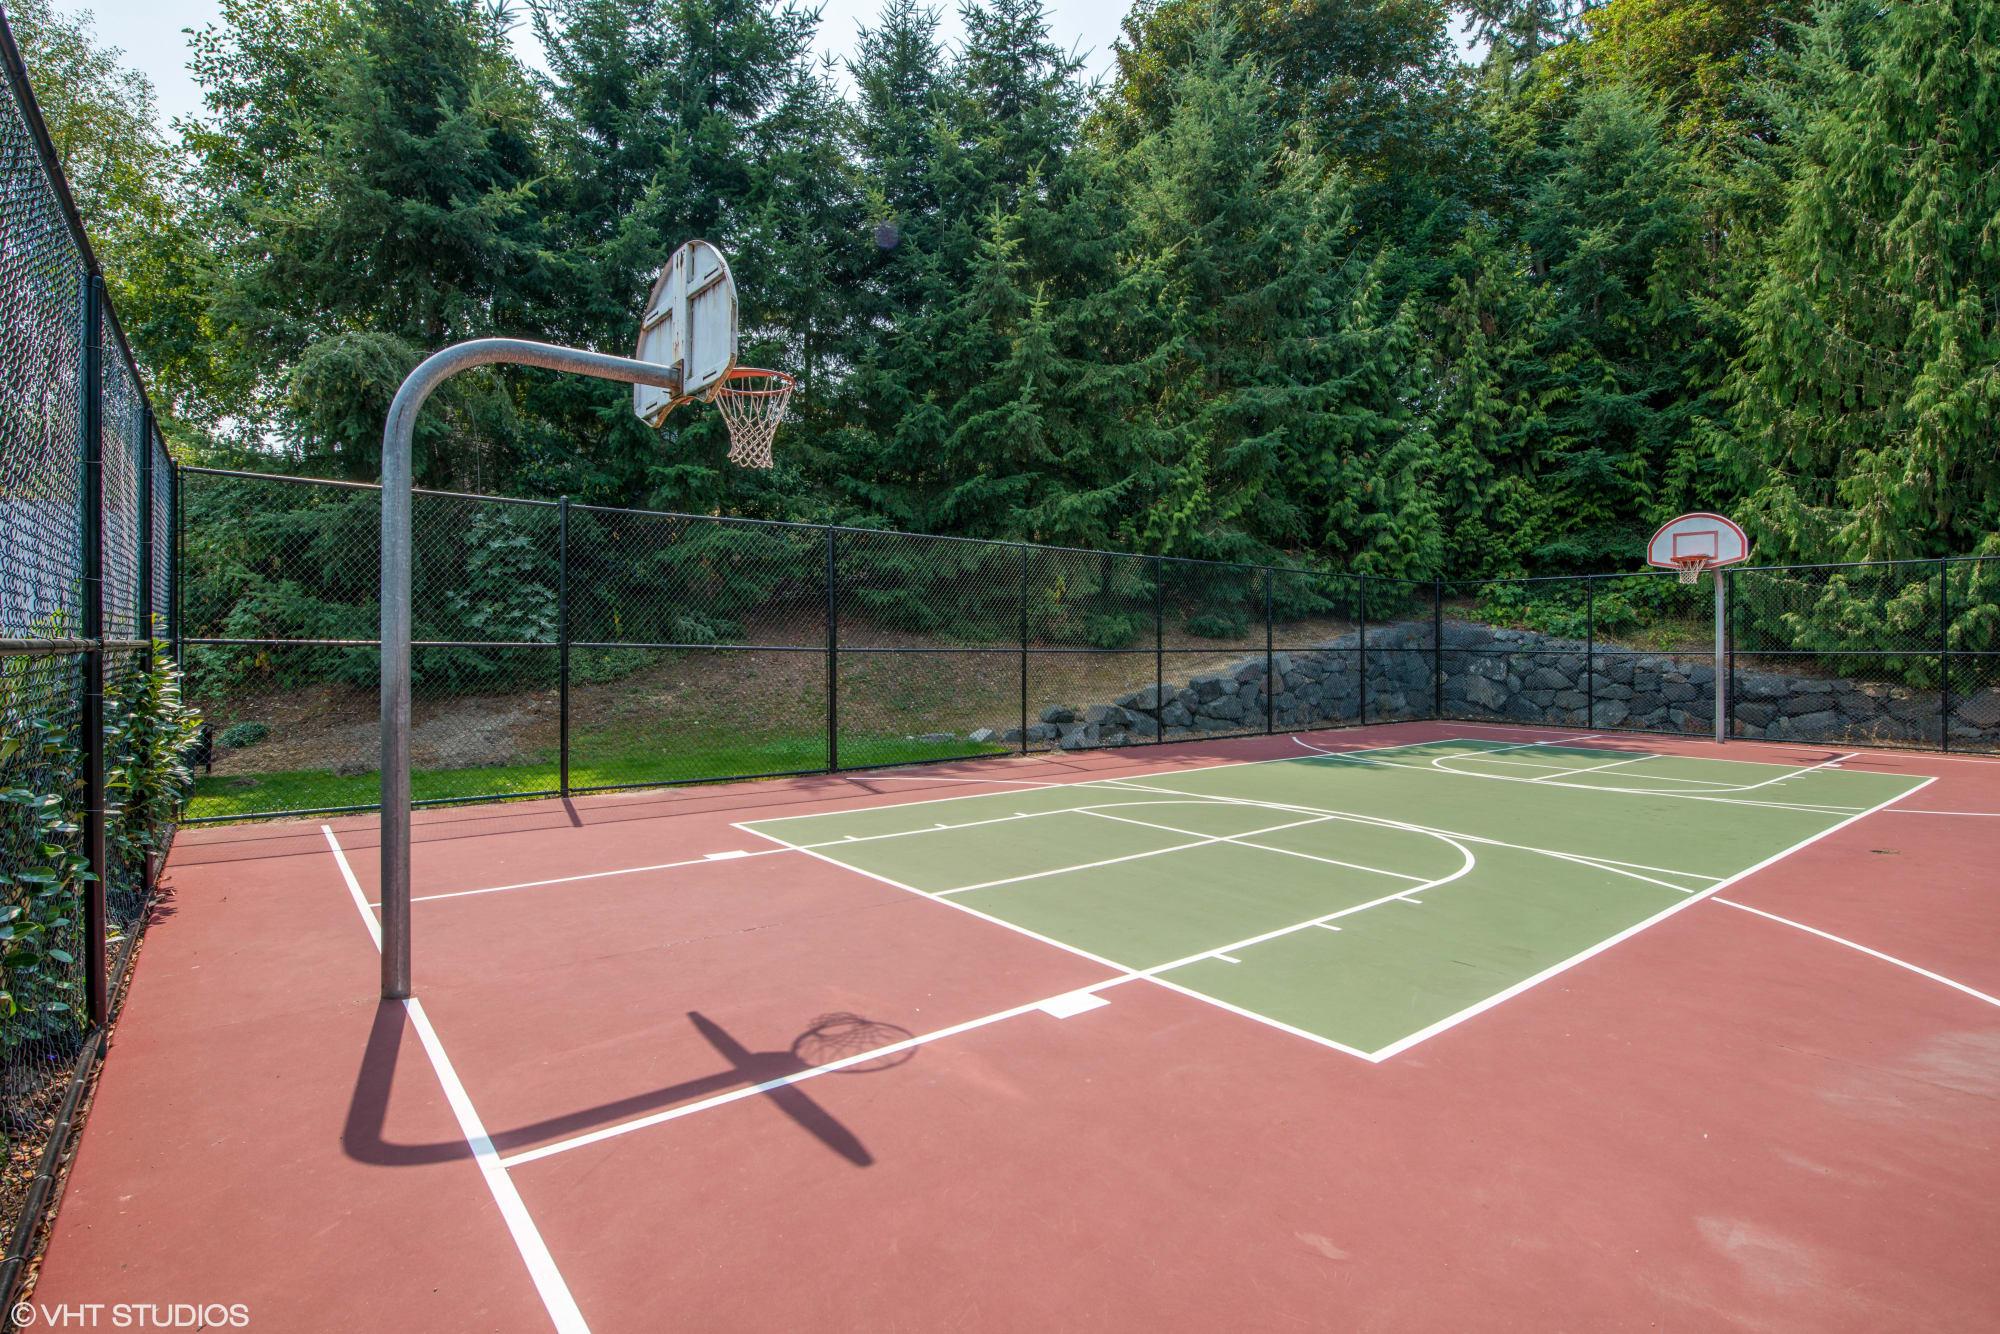 A basketball court at Brookside Village in Auburn, Washington